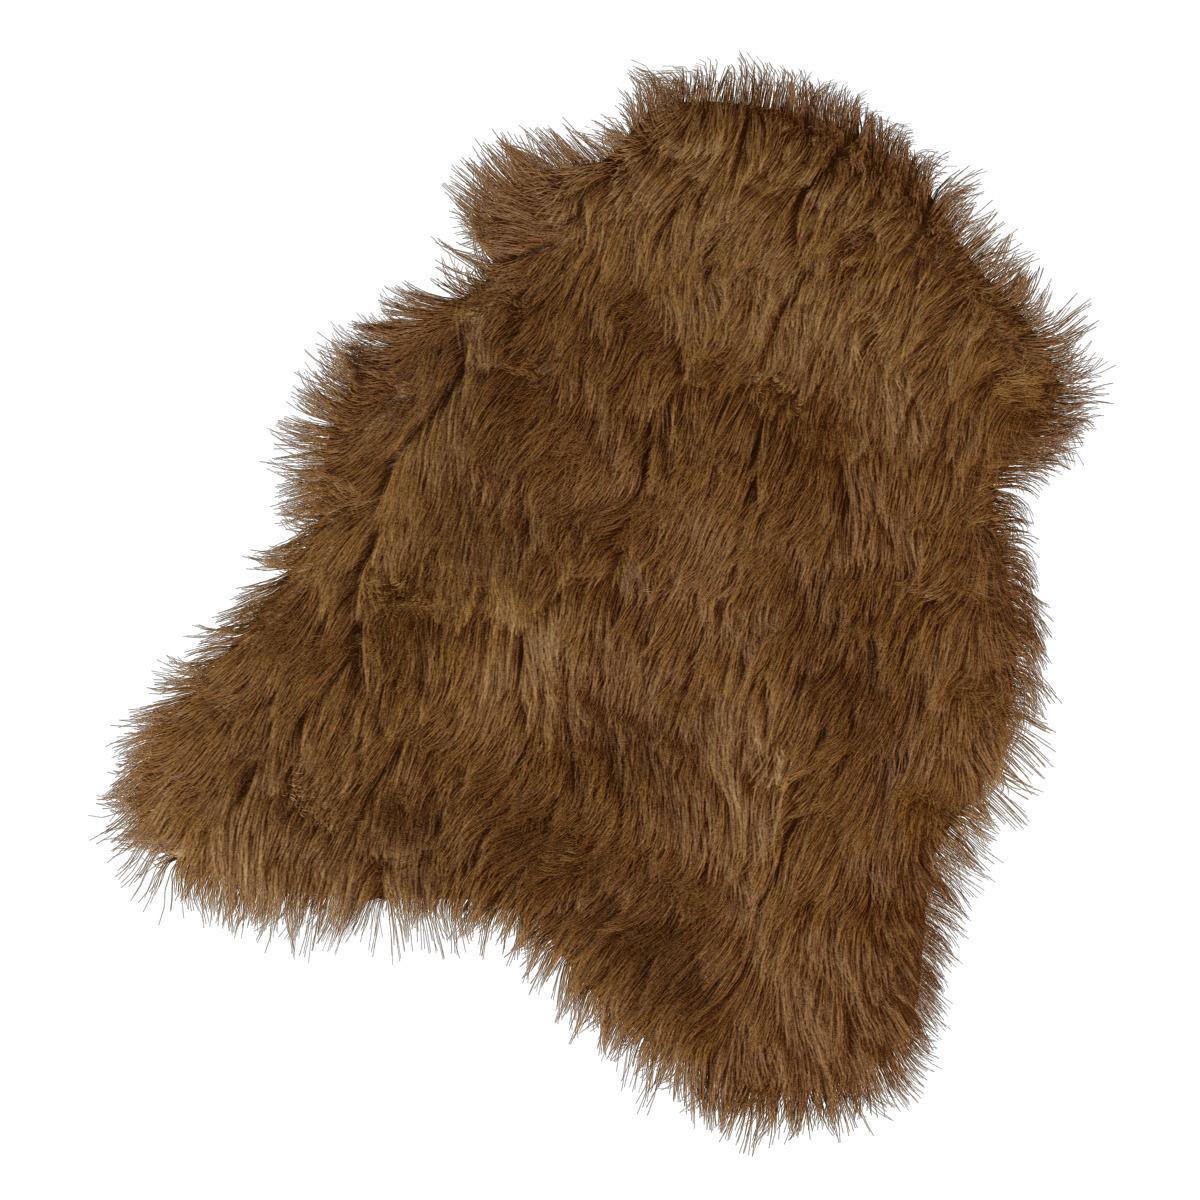 The mat of artificial fur